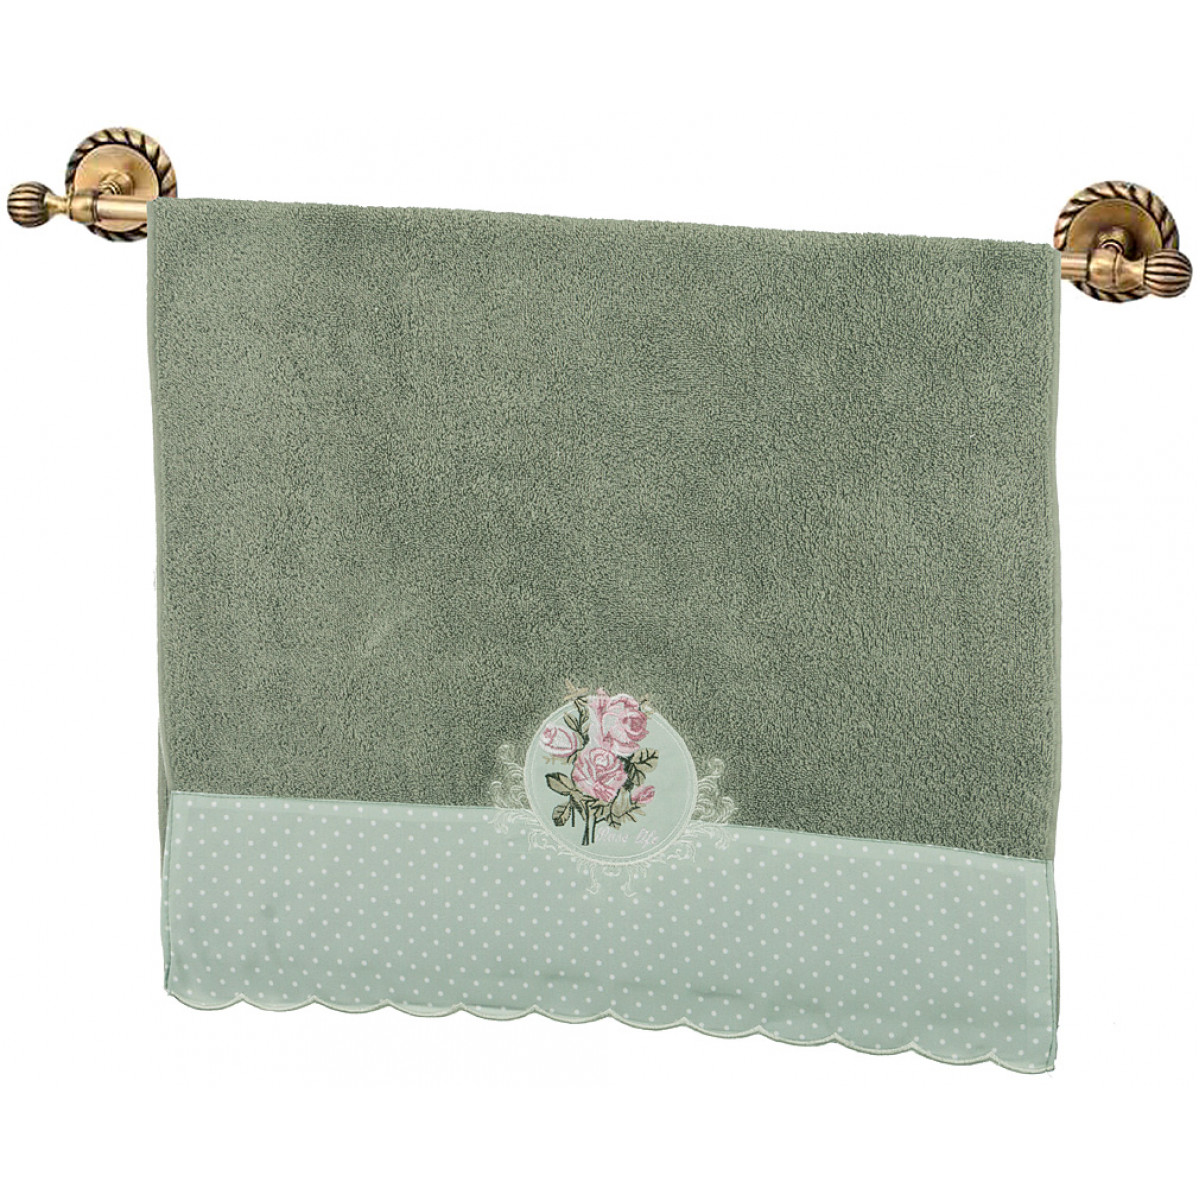 Полотенца Santalino Полотенце Clinton  (50х90 см) полотенца банные la pastel полотенце кружево 50х90 см